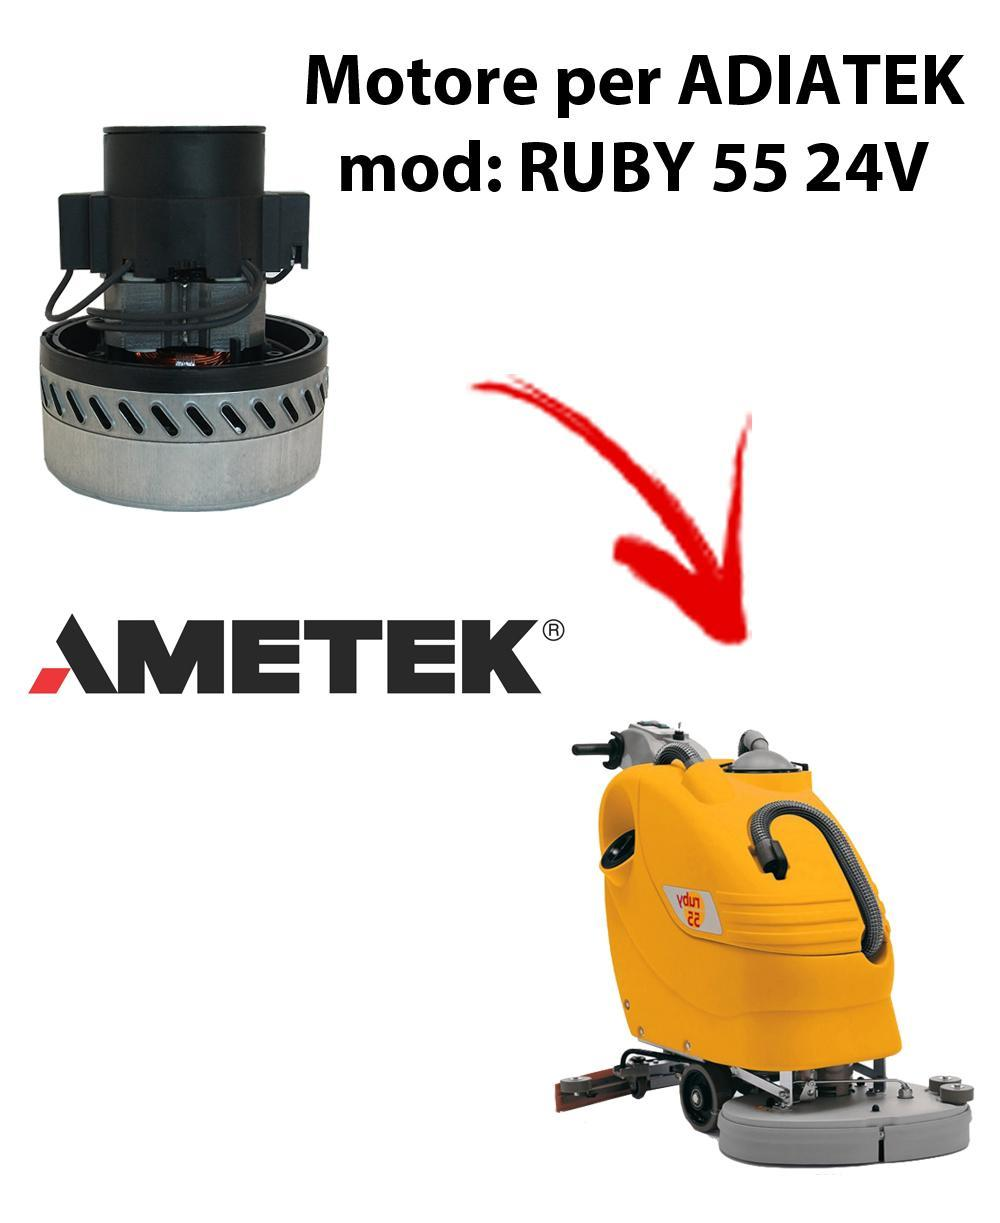 RUBY 55 24 volt. Motore de aspiración Ametek Italia  para fregadora Adiatek